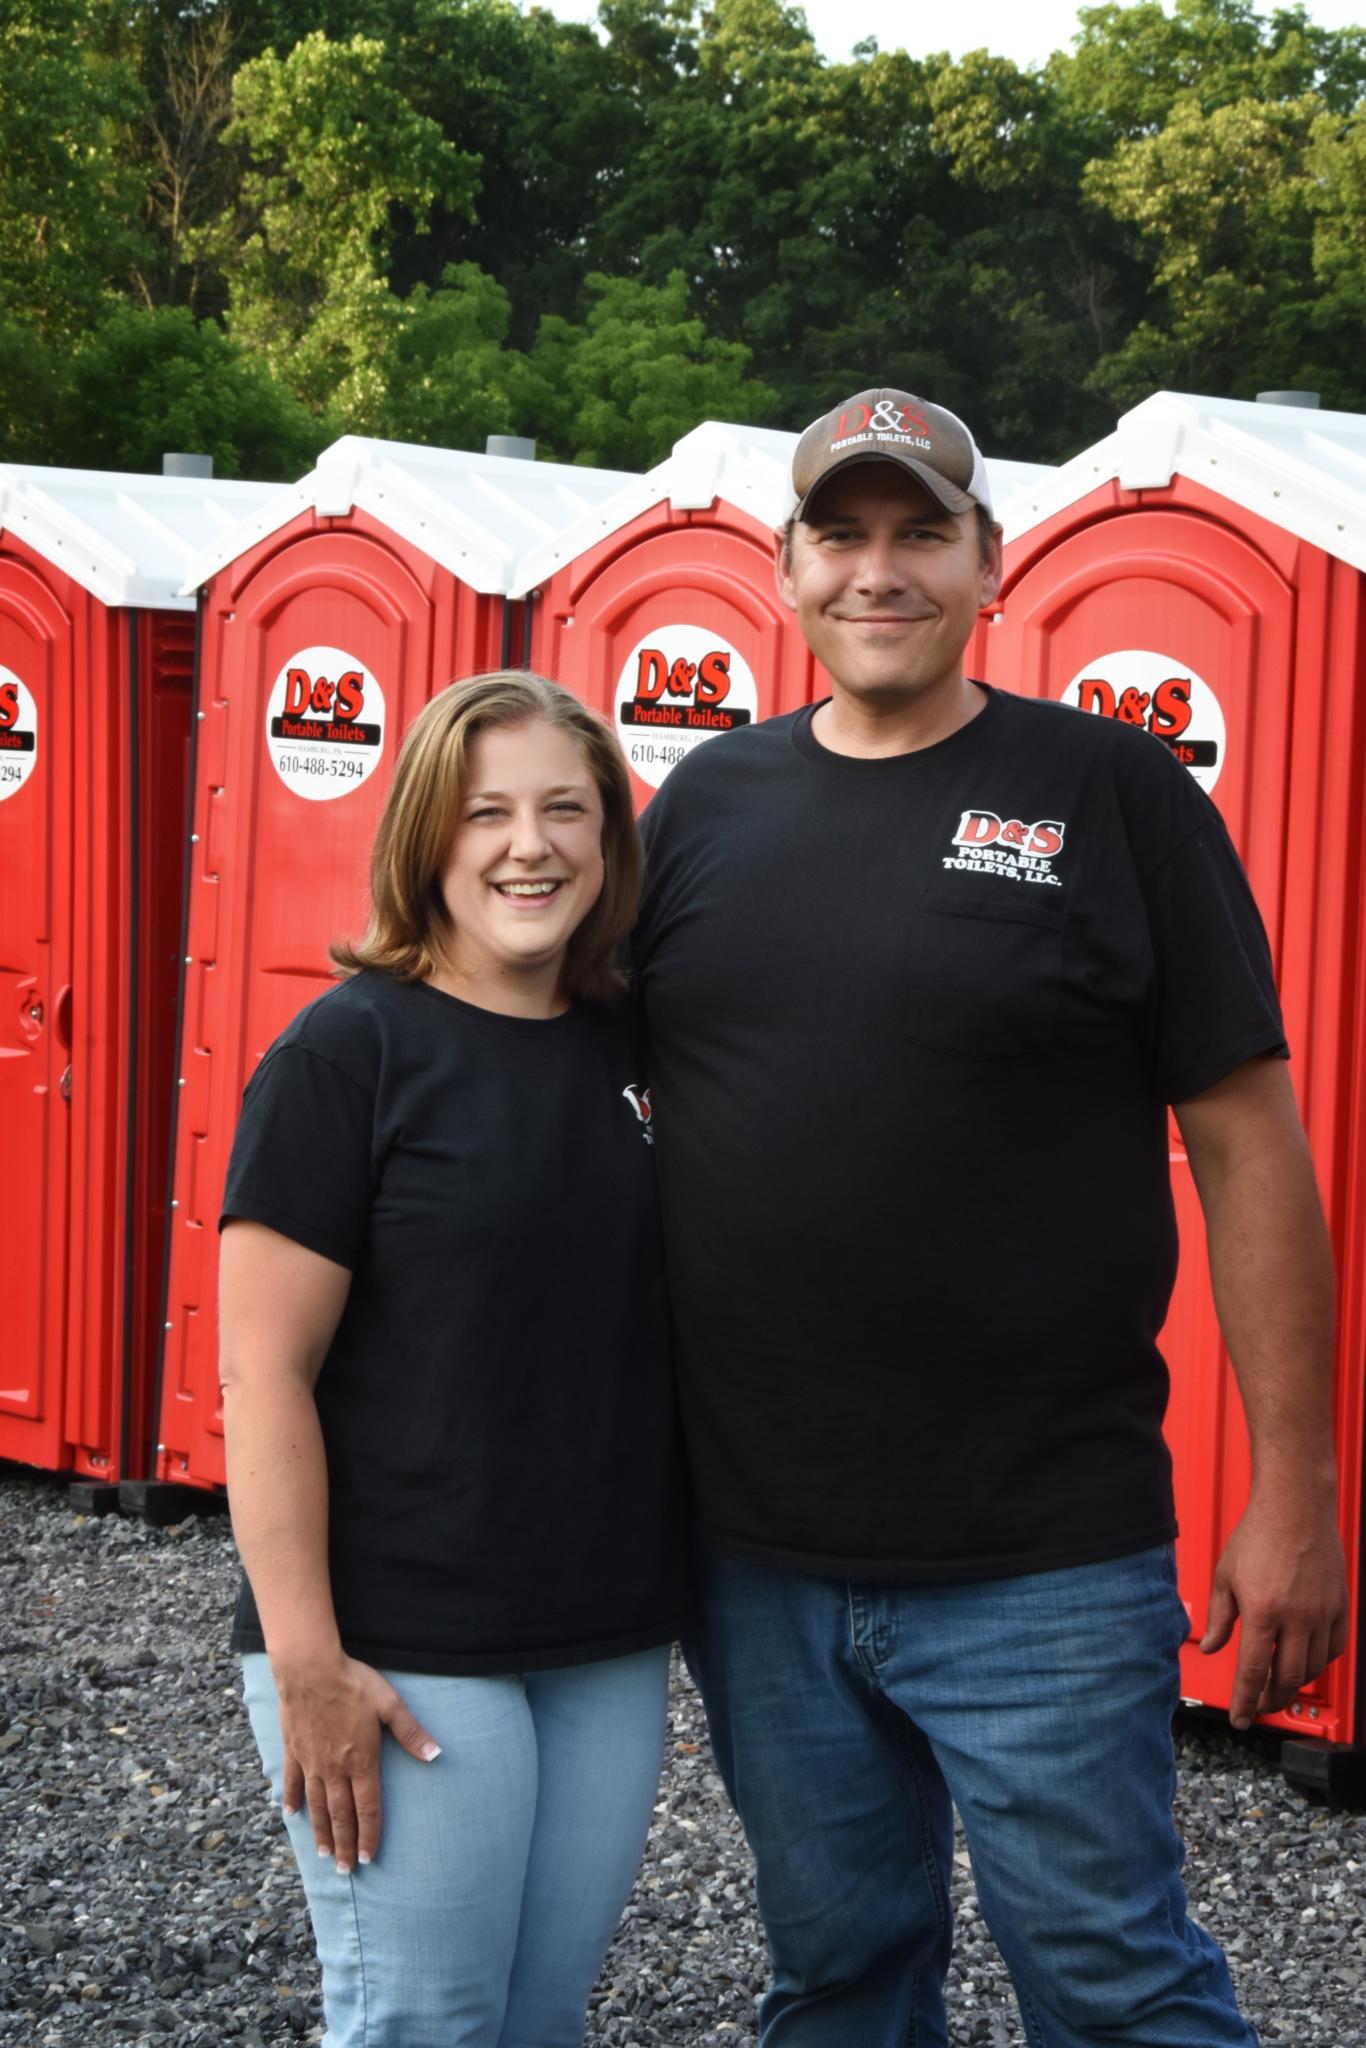 Sara and Dennis Kline of D&S Portable Toilets in Hamburg, Pennsylvania